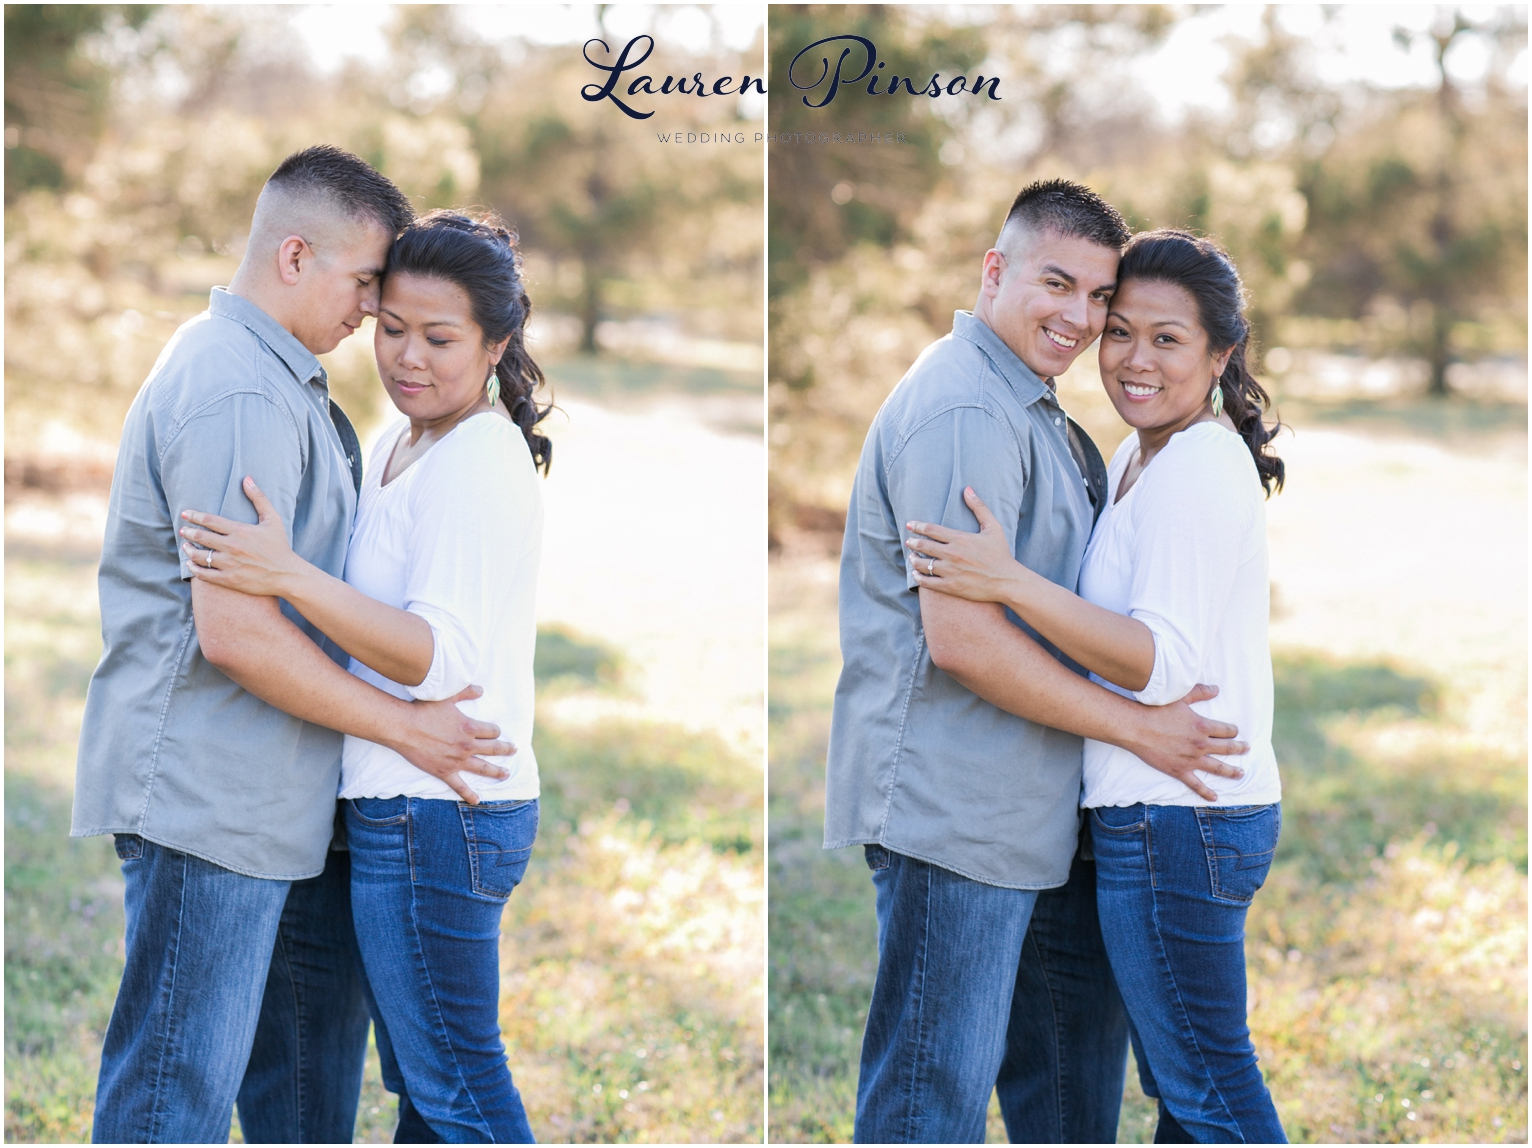 wichita-falls-wedding-photographer-engagement-session-texas-photography-oklahoma-engagement-wedding-photography_0618.jpg